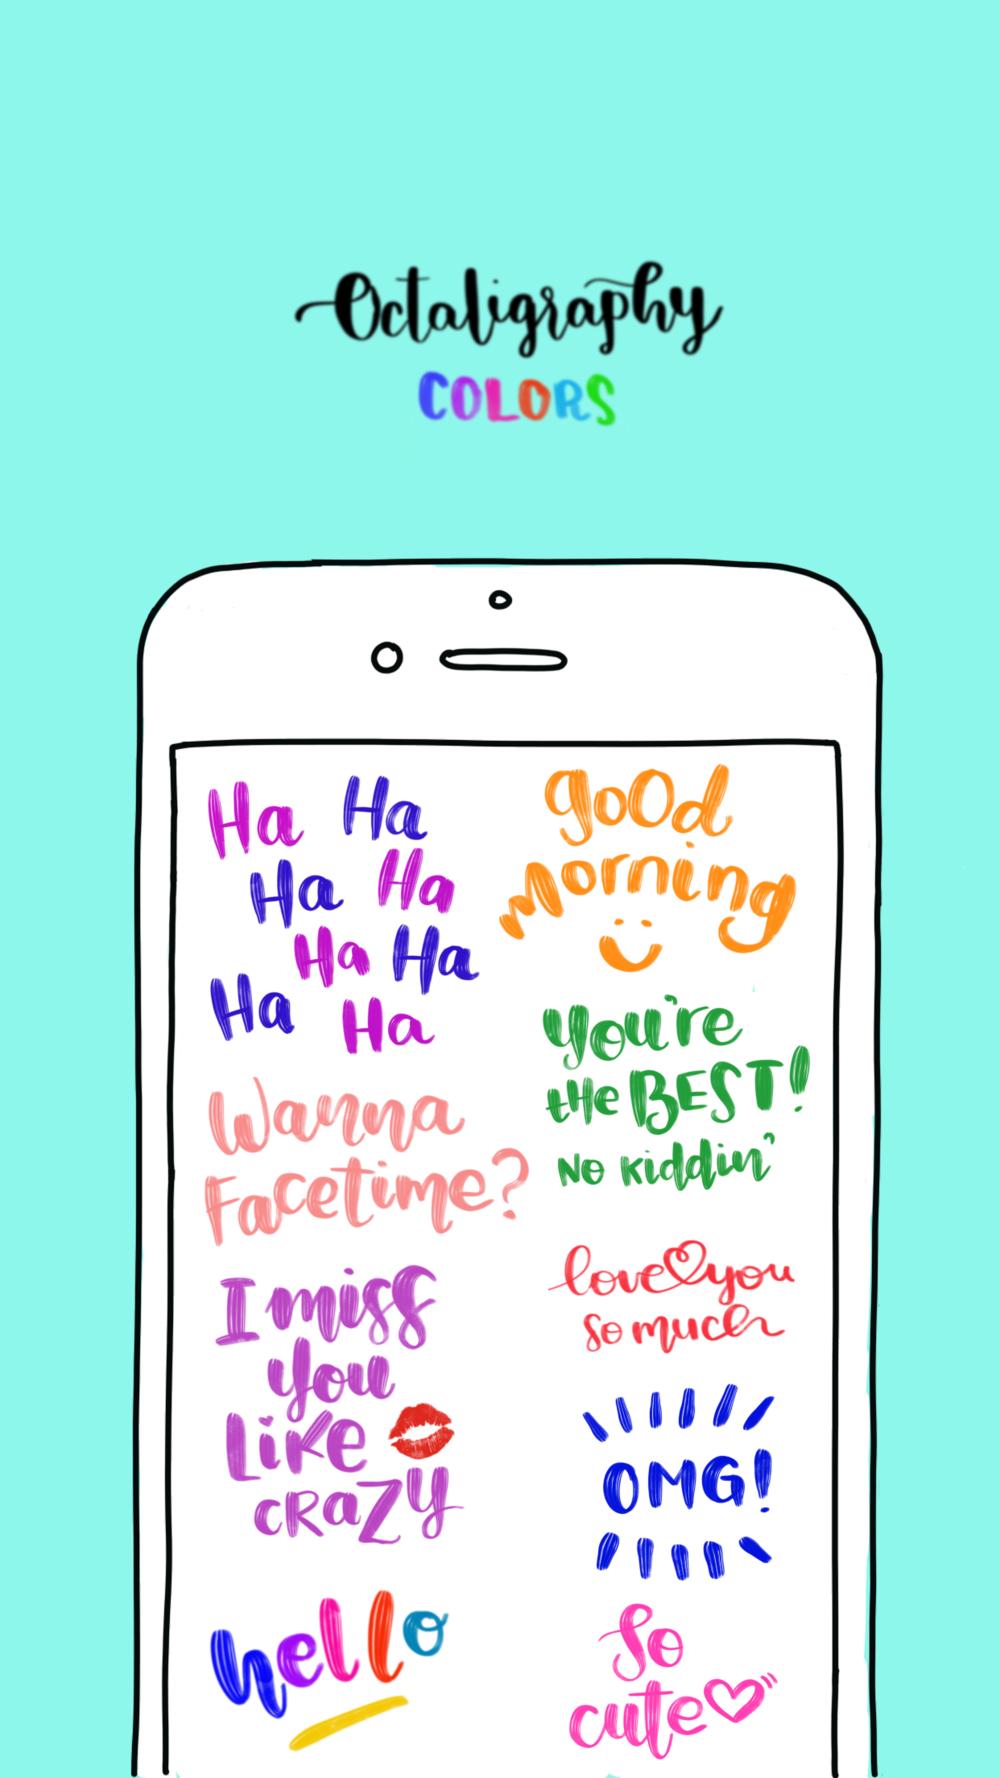 01 Colors - Screenshots iPhone Plus.png